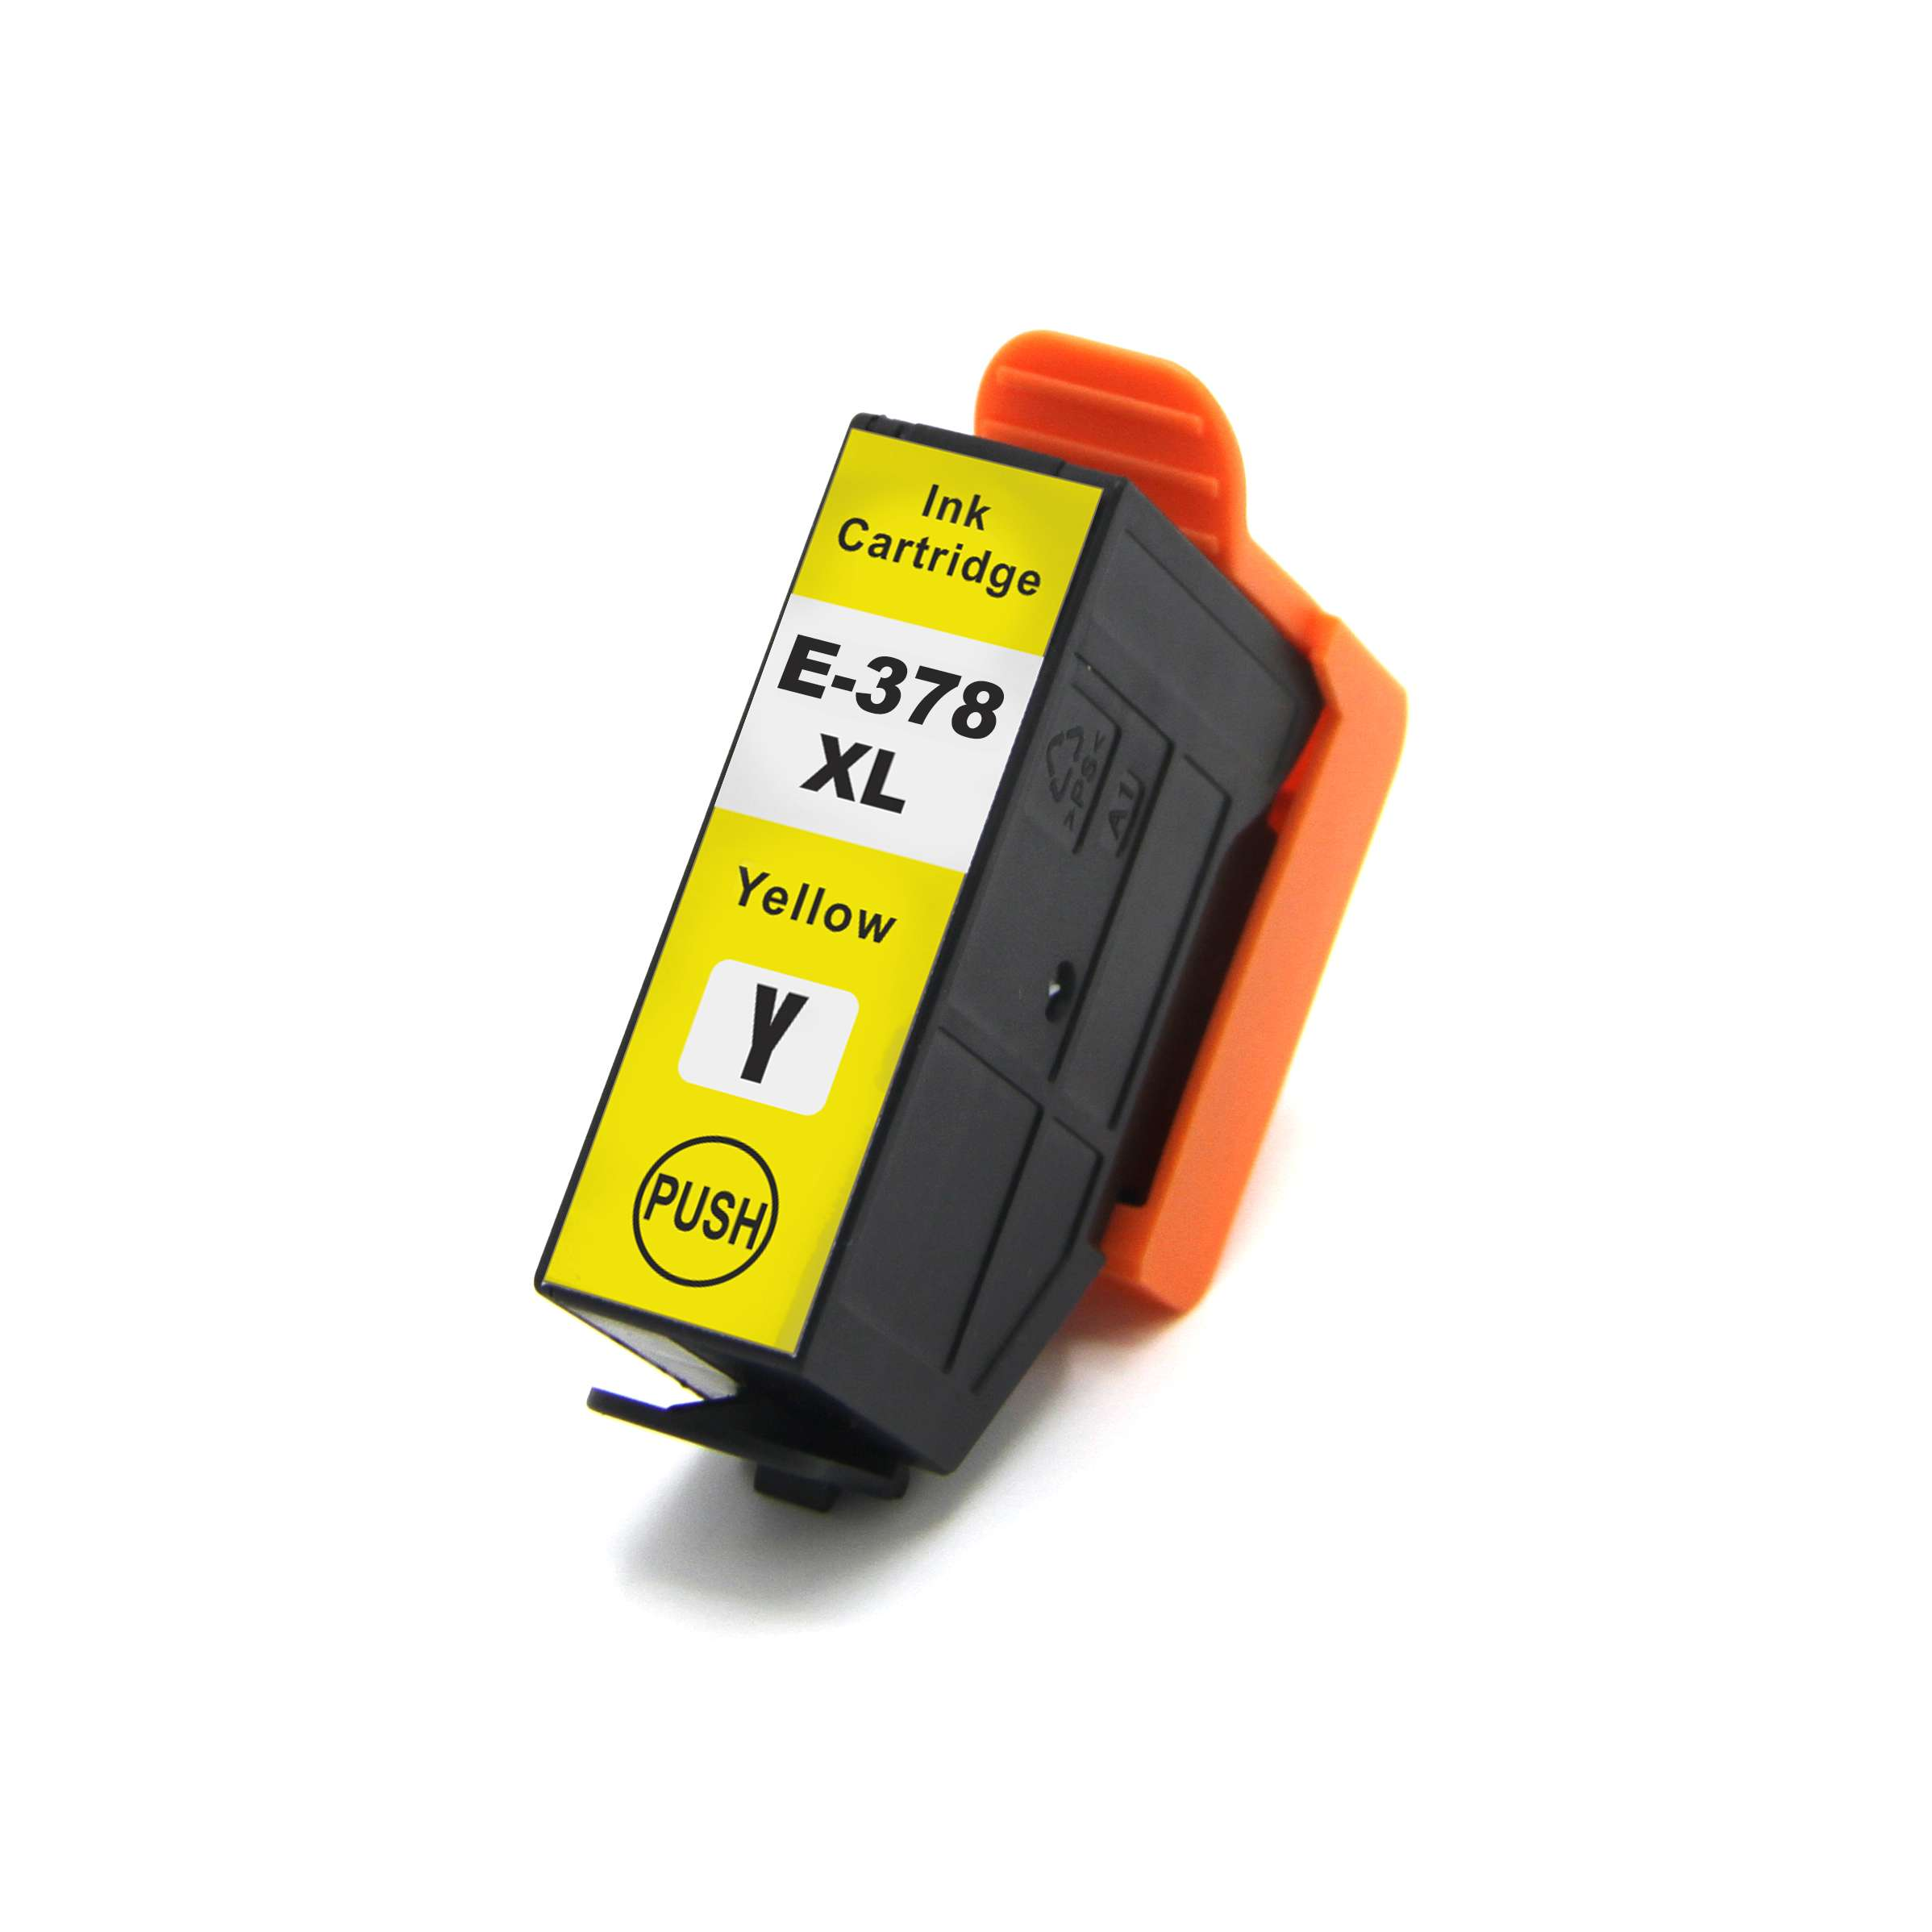 Epson T378XLY Yellow Ink Cartridge